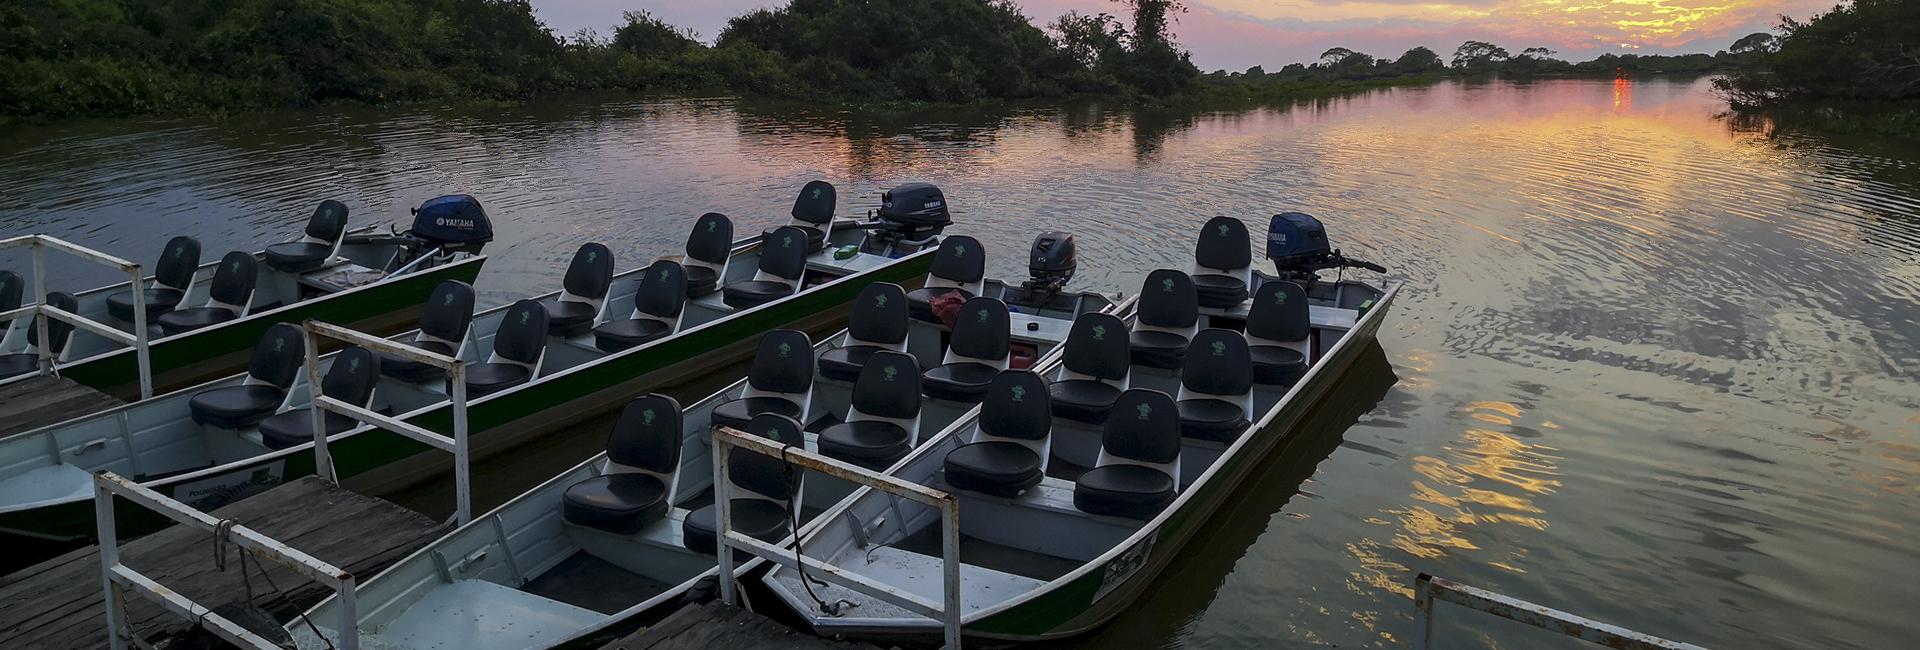 Jofre River in Pantanal